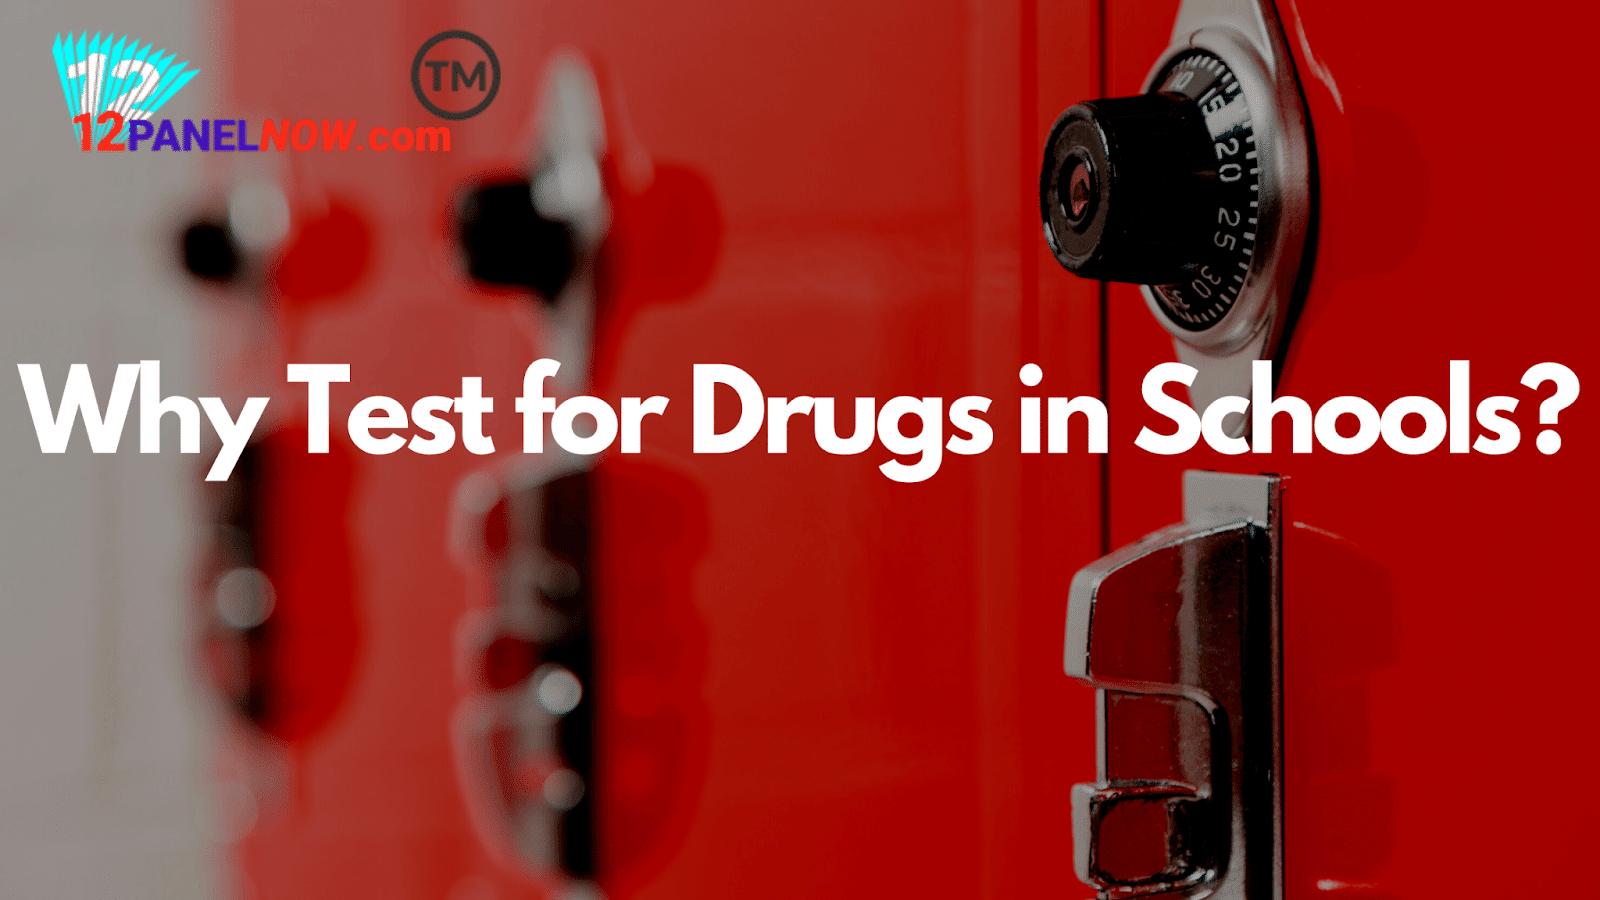 When Did Drug Testing Start in Schools?